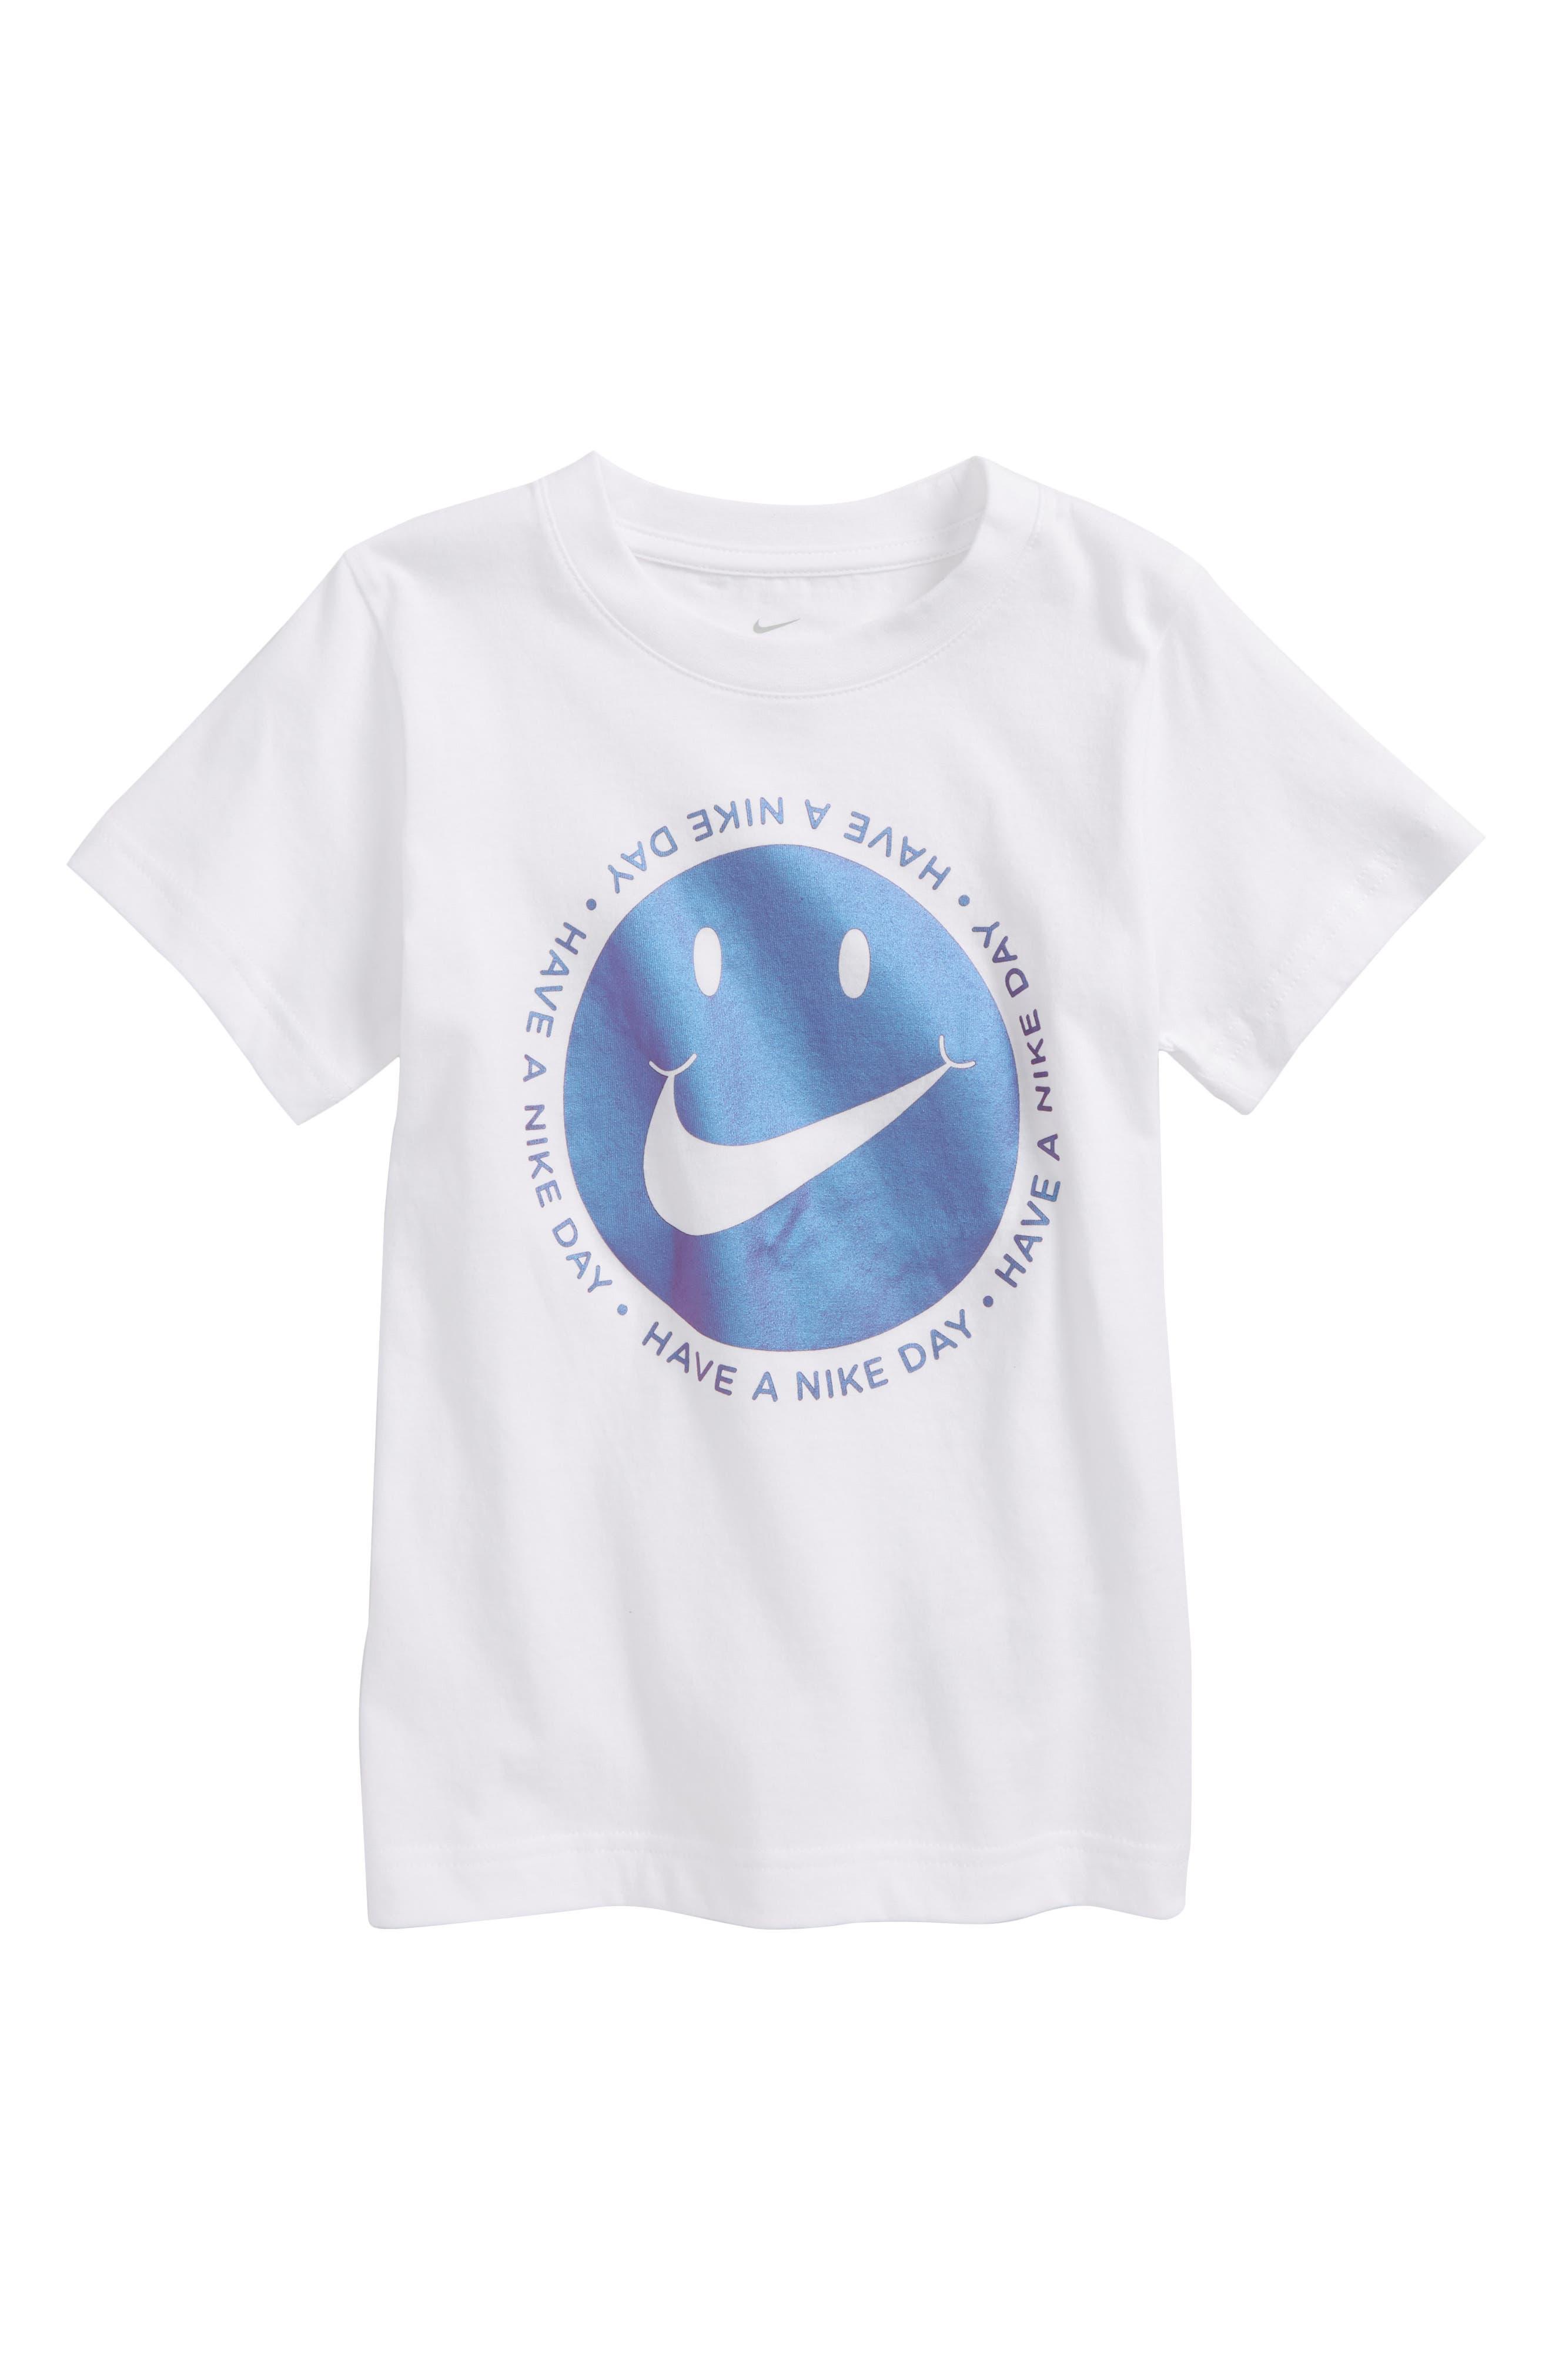 DNA T-Shirt,                             Main thumbnail 1, color,                             White